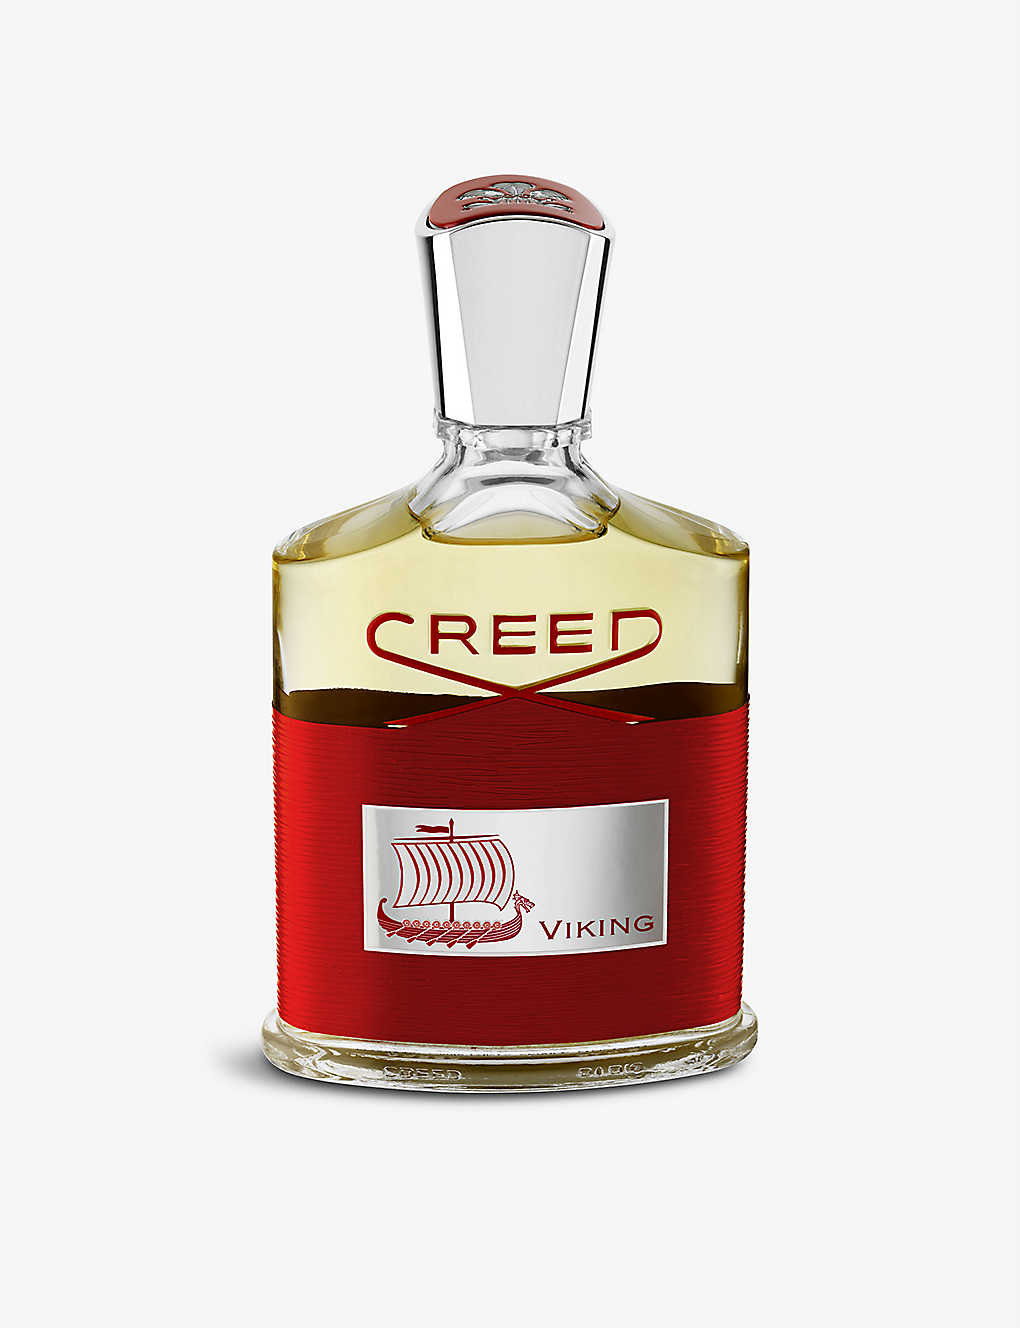 Creed Beauty Selfridges Shop Online